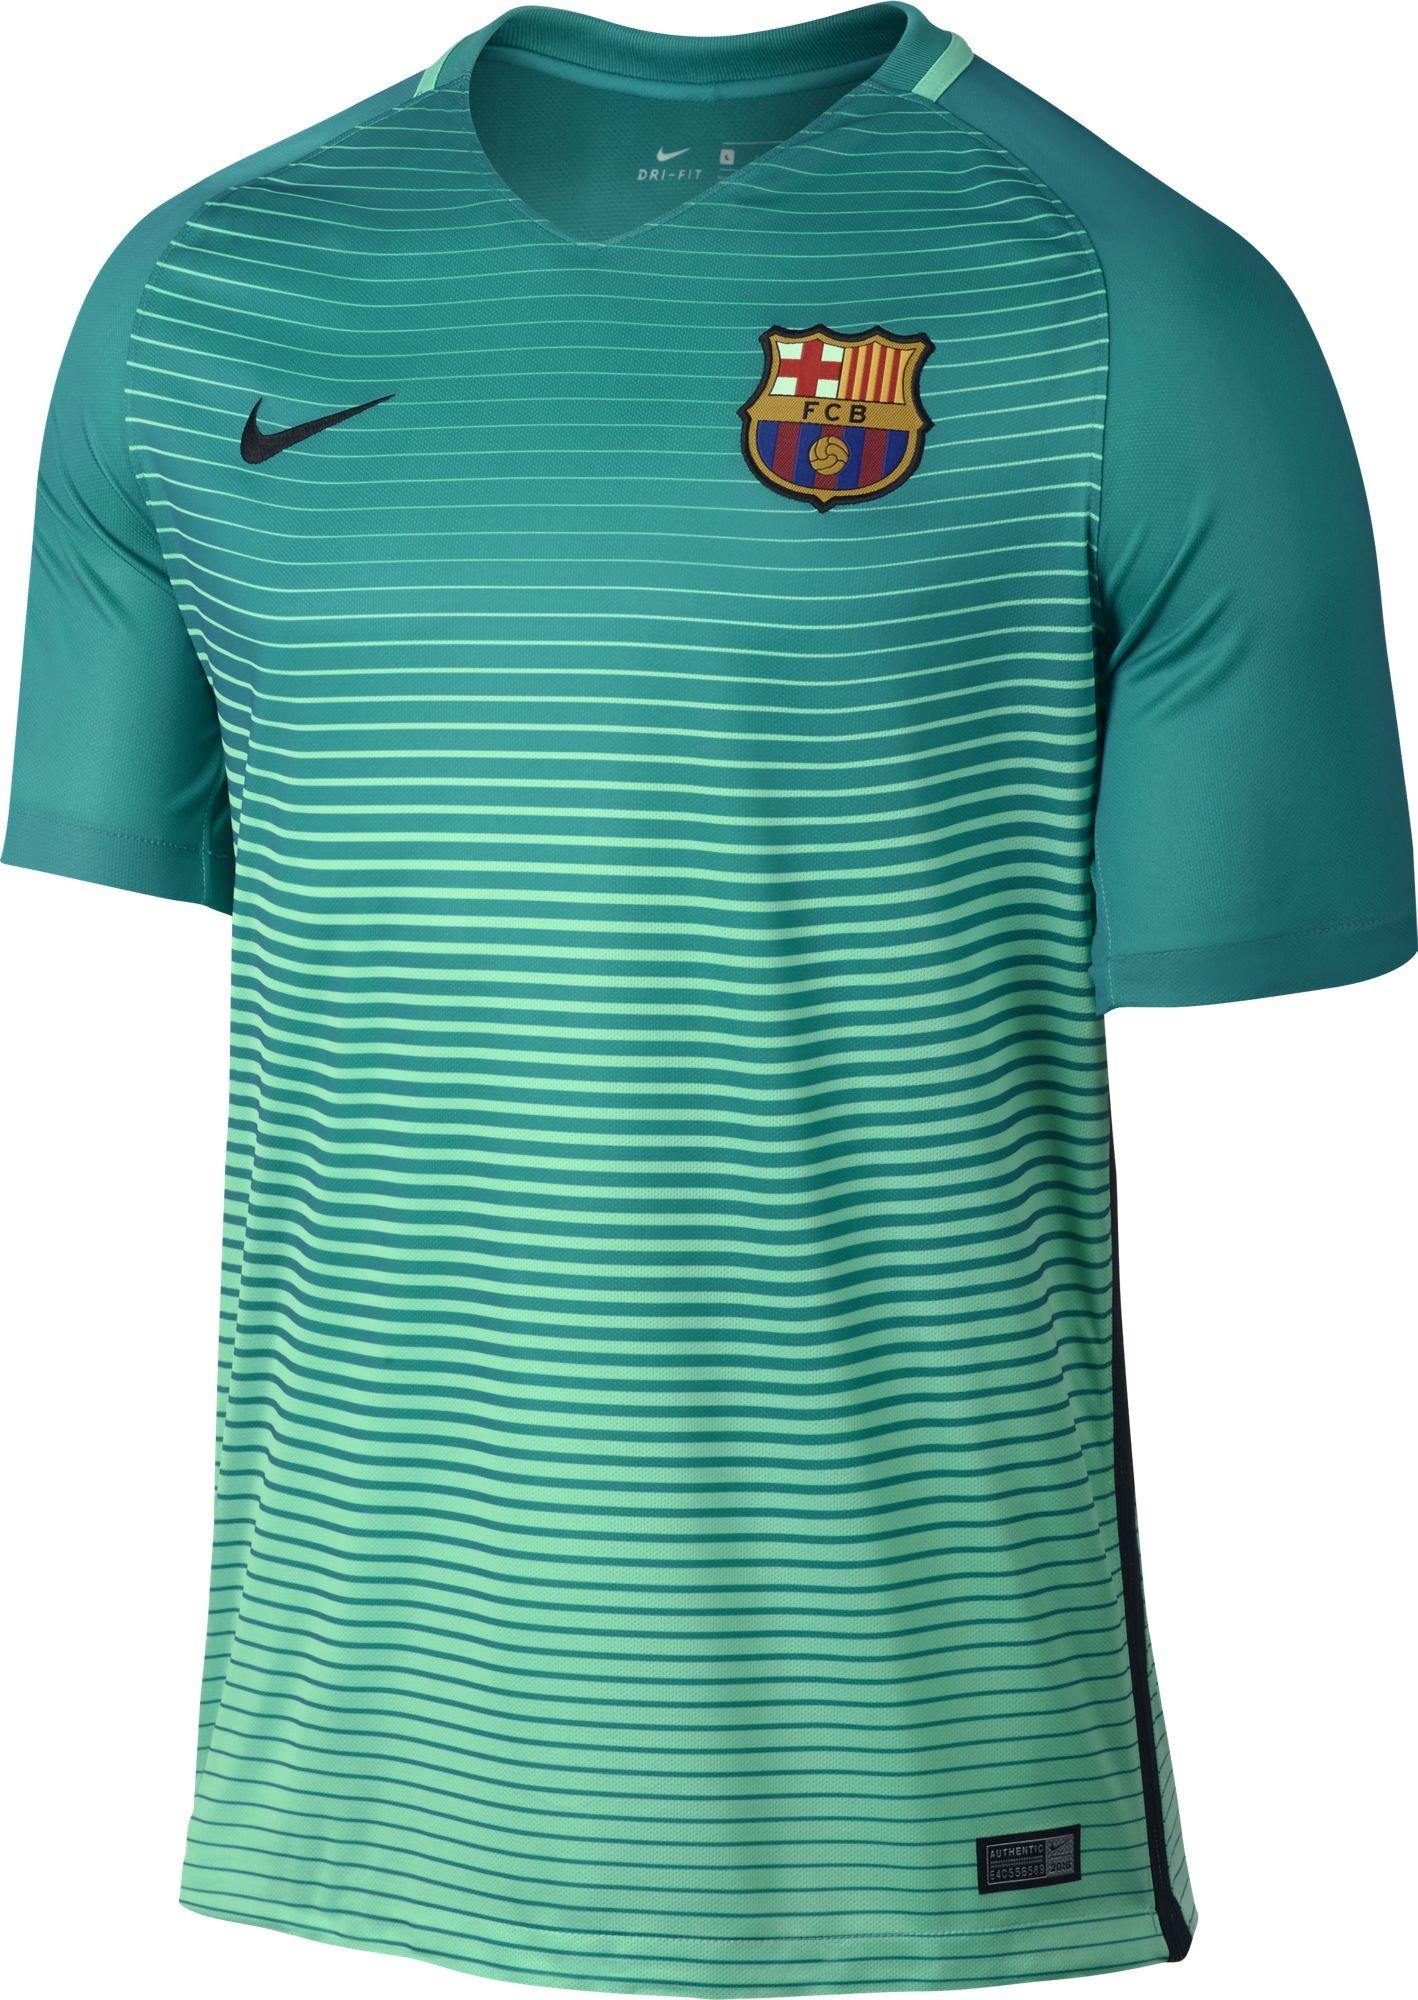 finest selection aeb19 bd04e Soccer Shirts Near Me